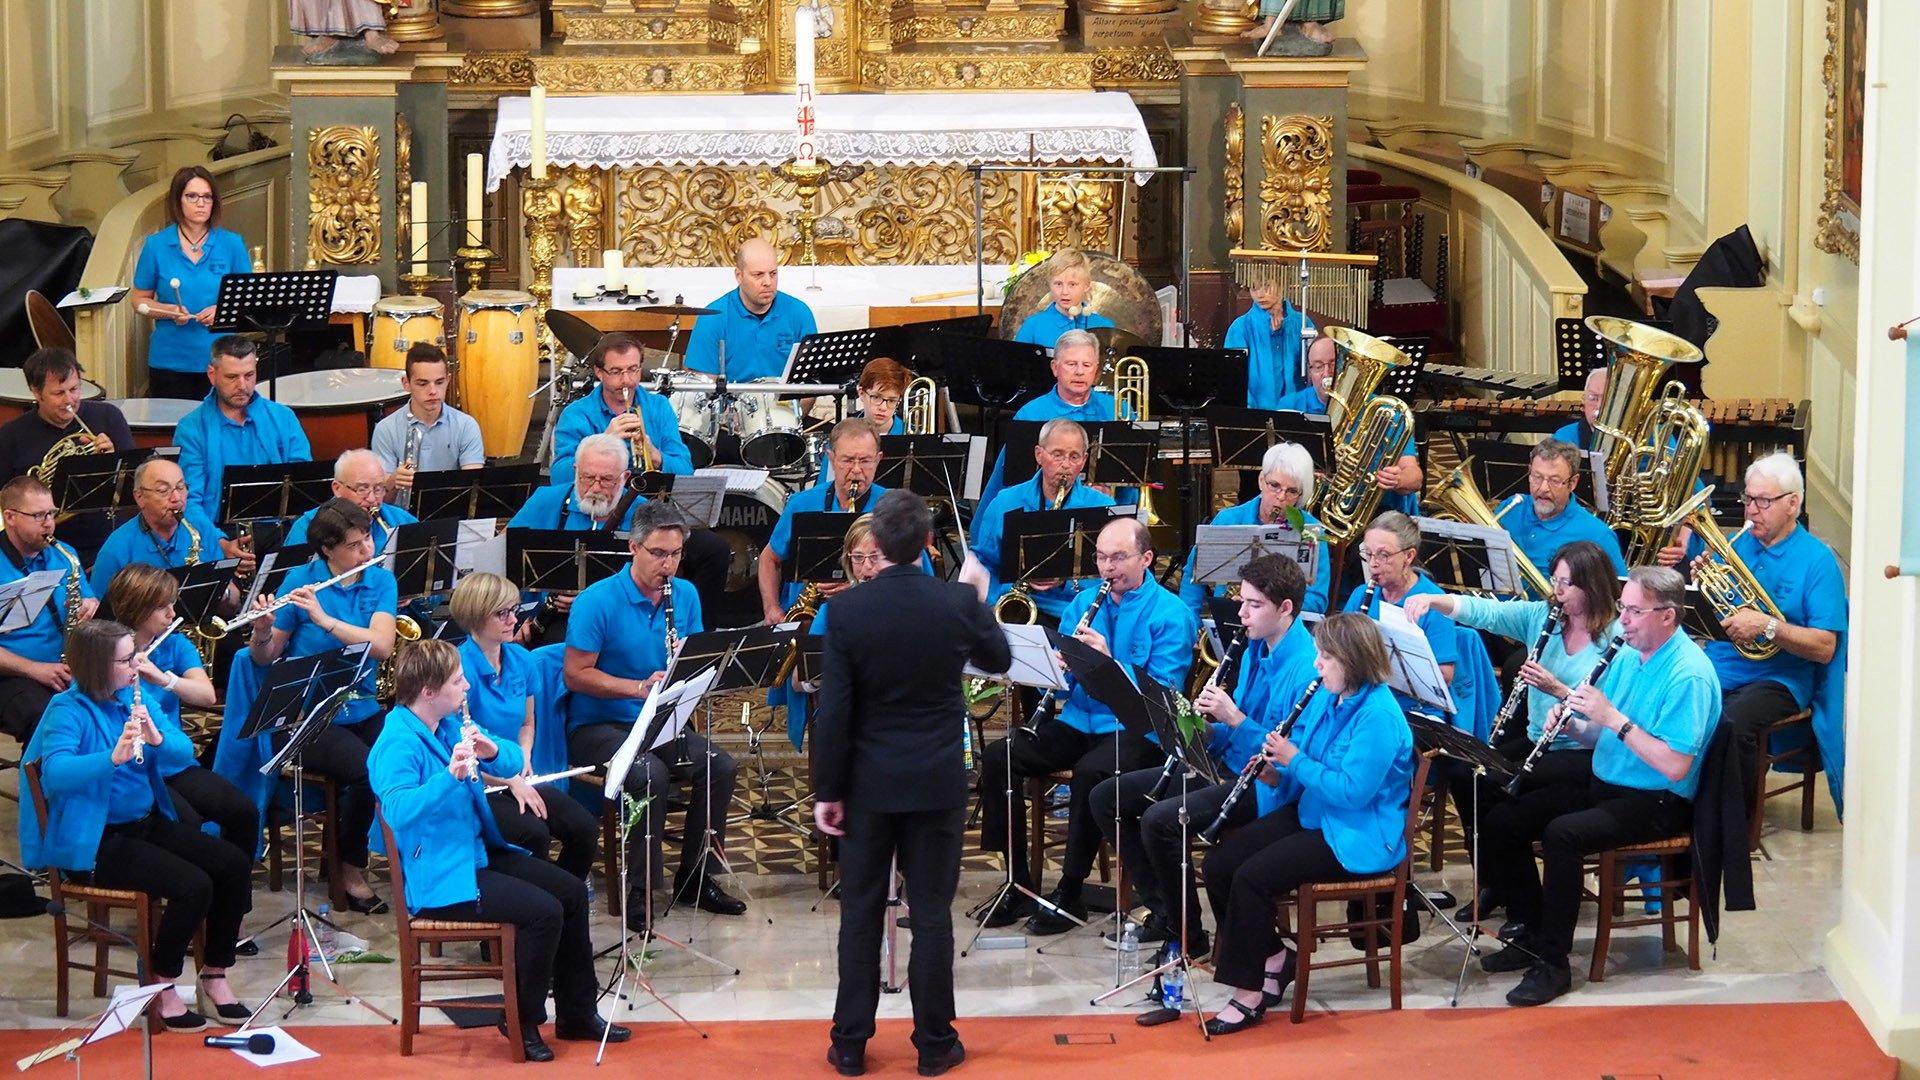 Orchestre Harmonie 1882 de Bollwiller